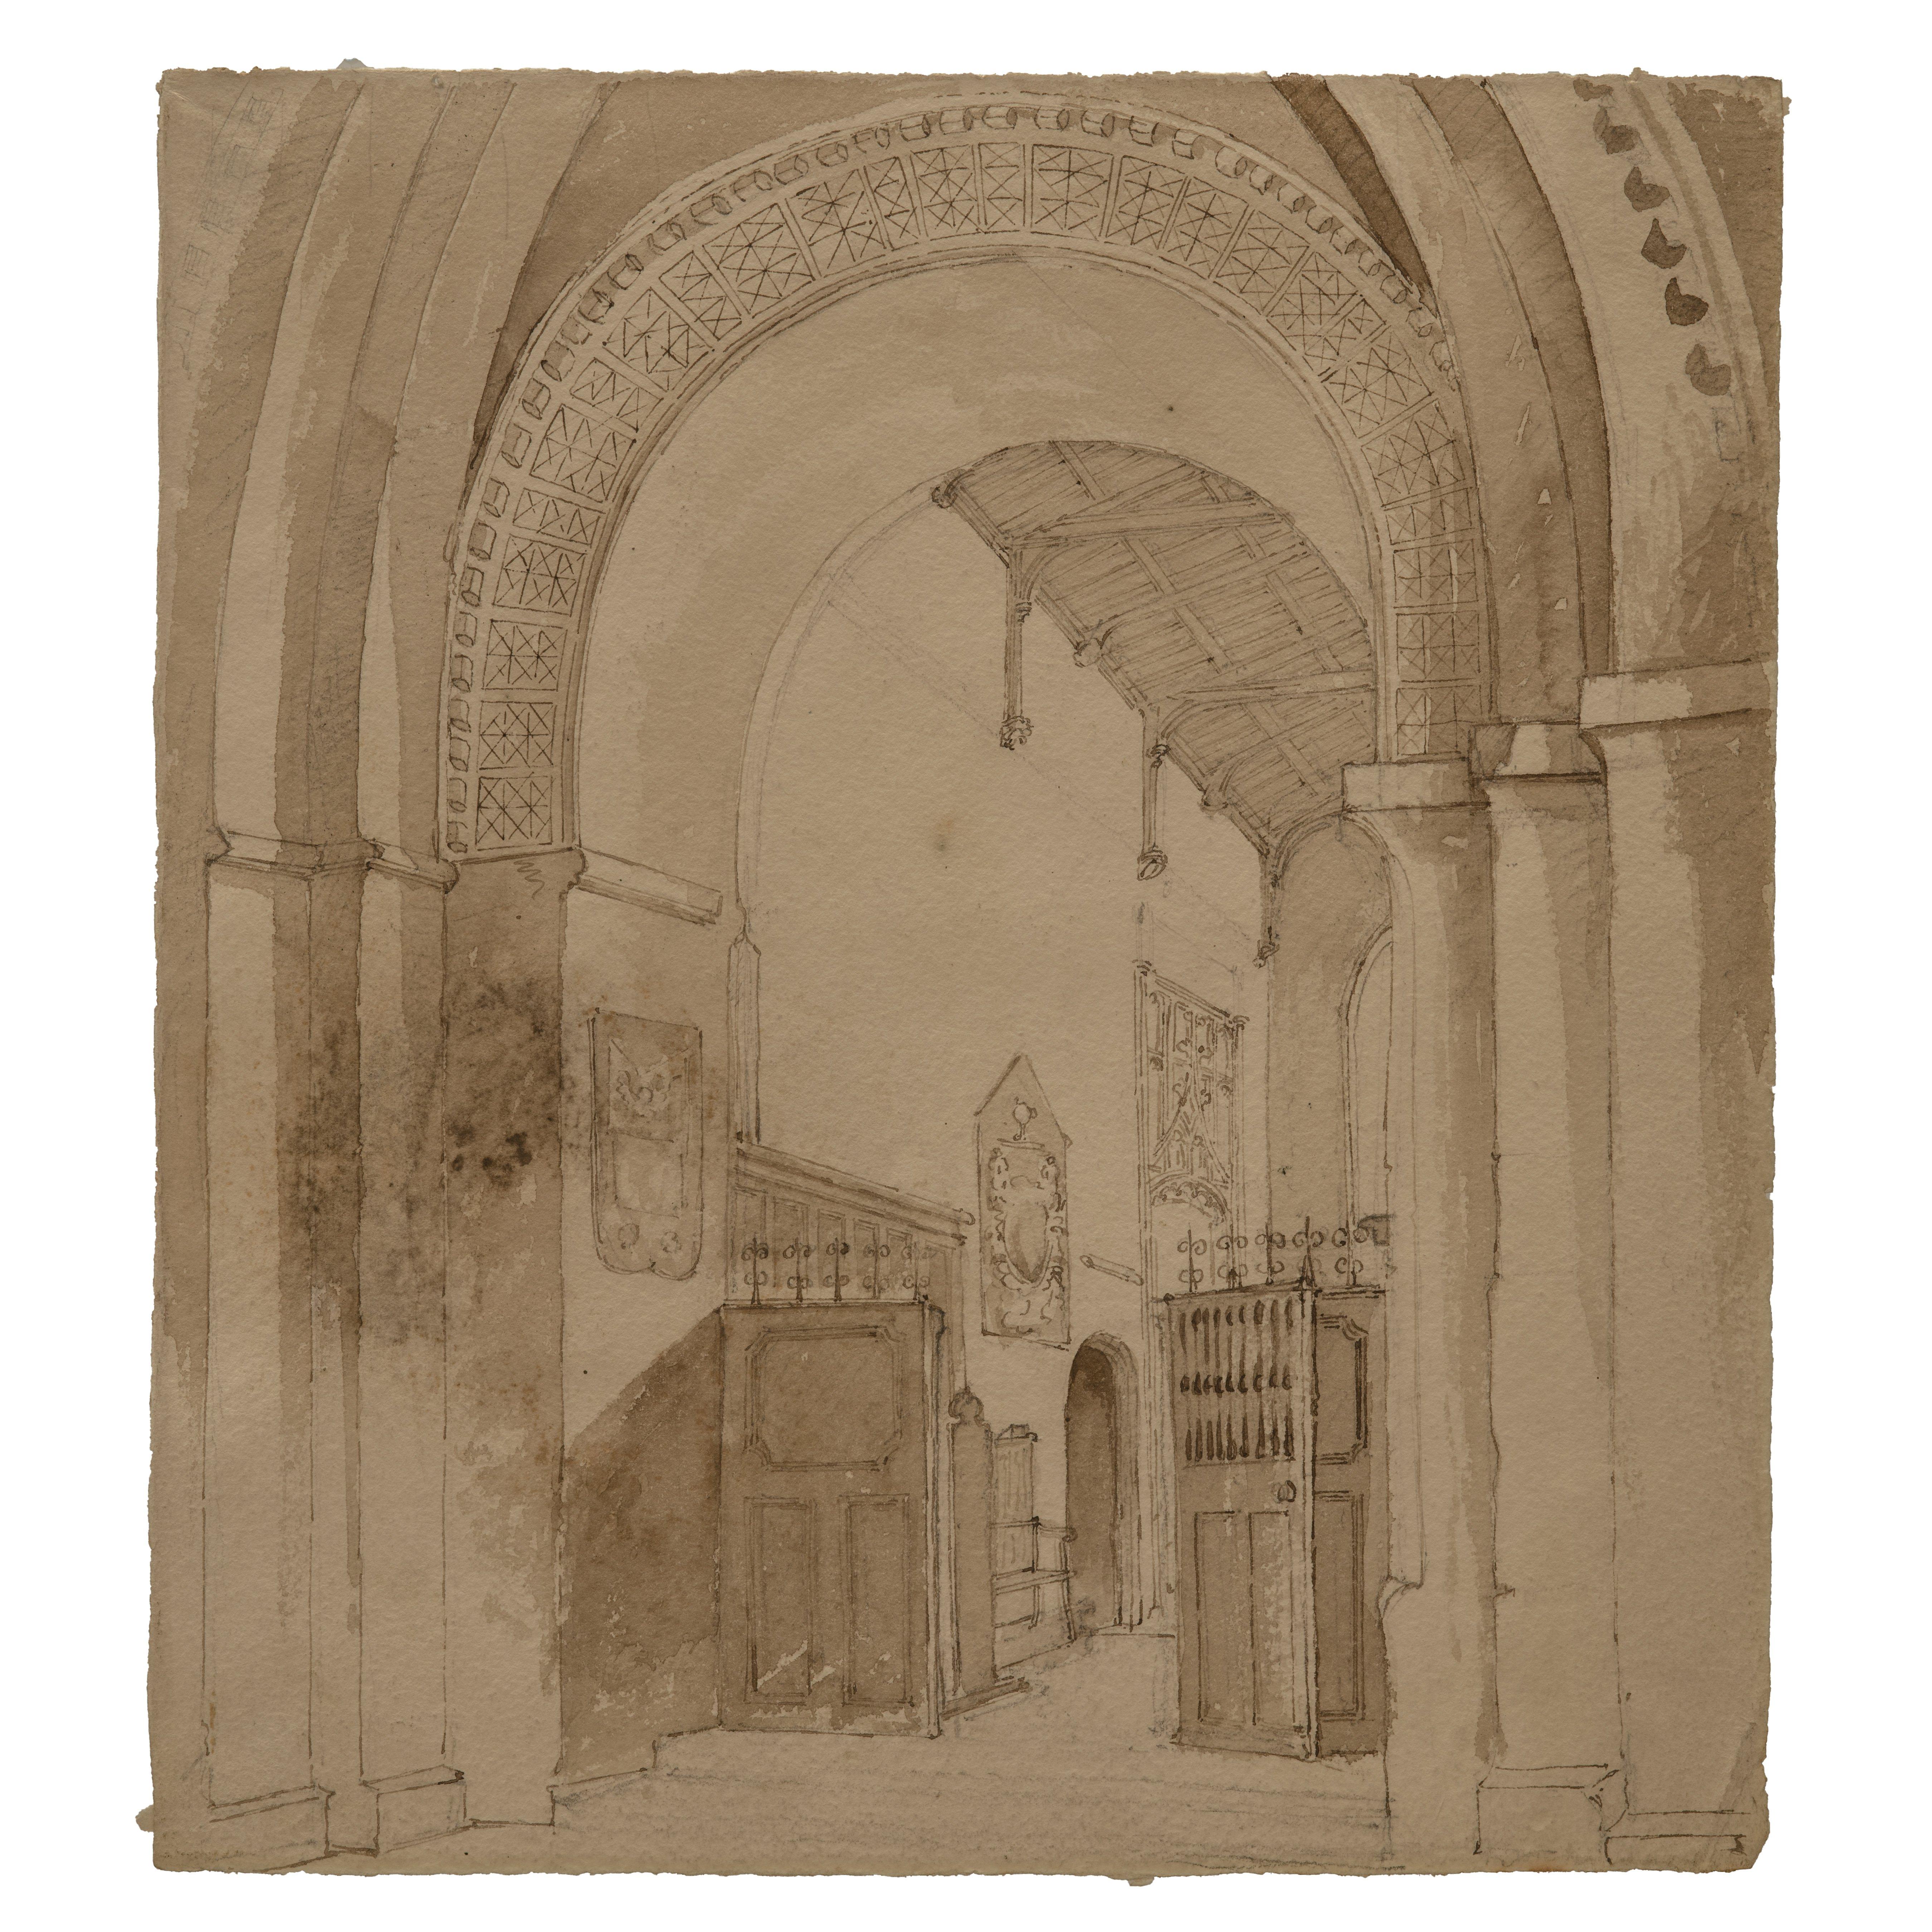 A Late 18th Century Northern European School Interior Scene Drawing